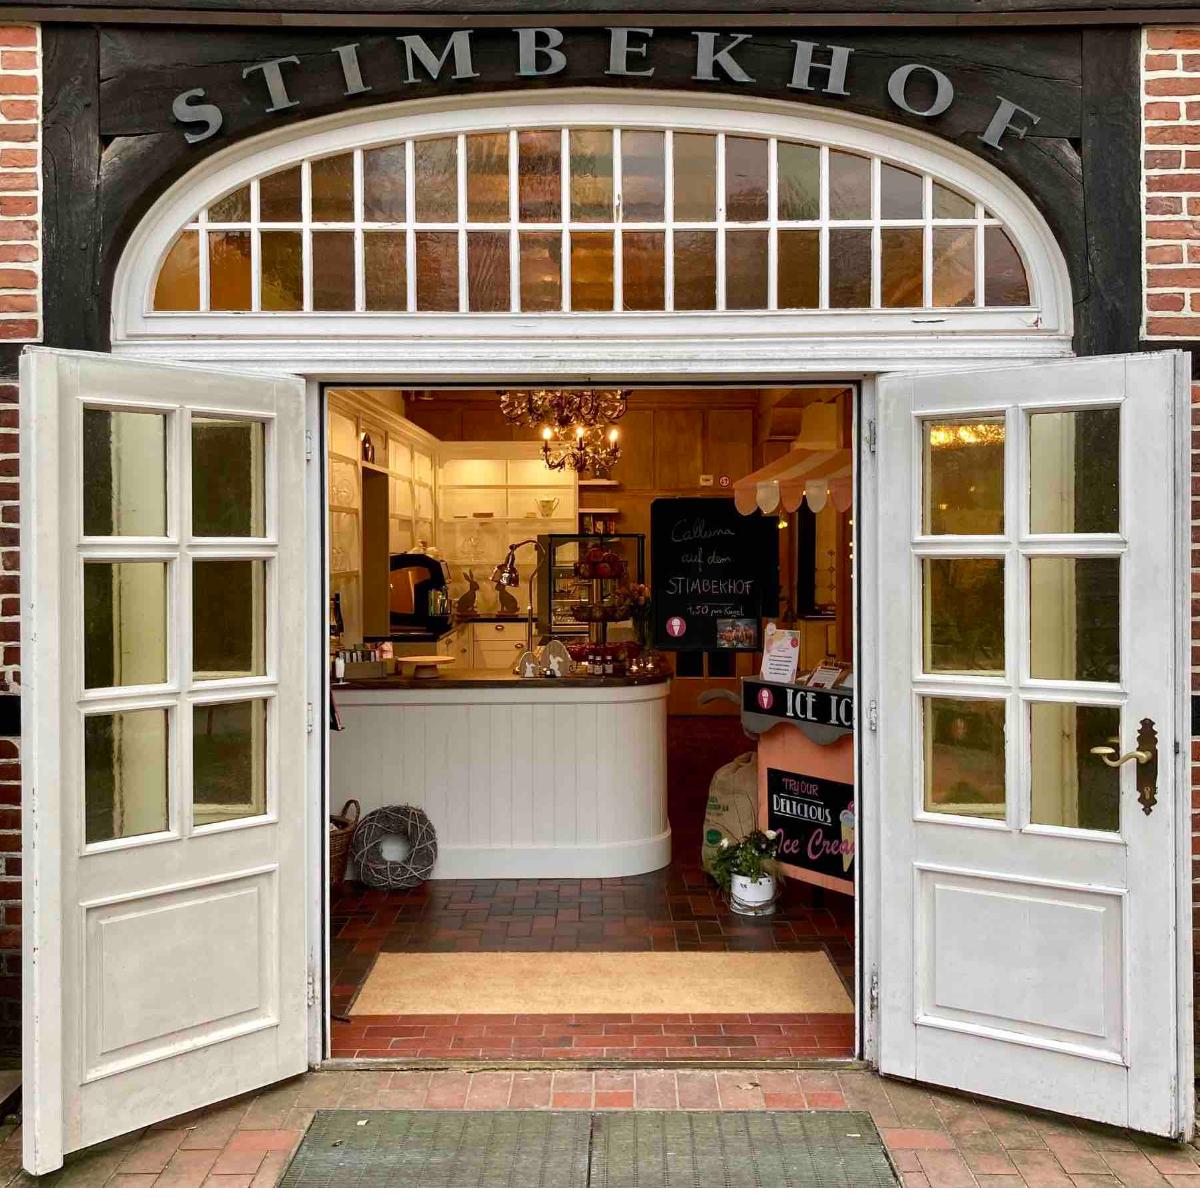 Stimbekhof (17)